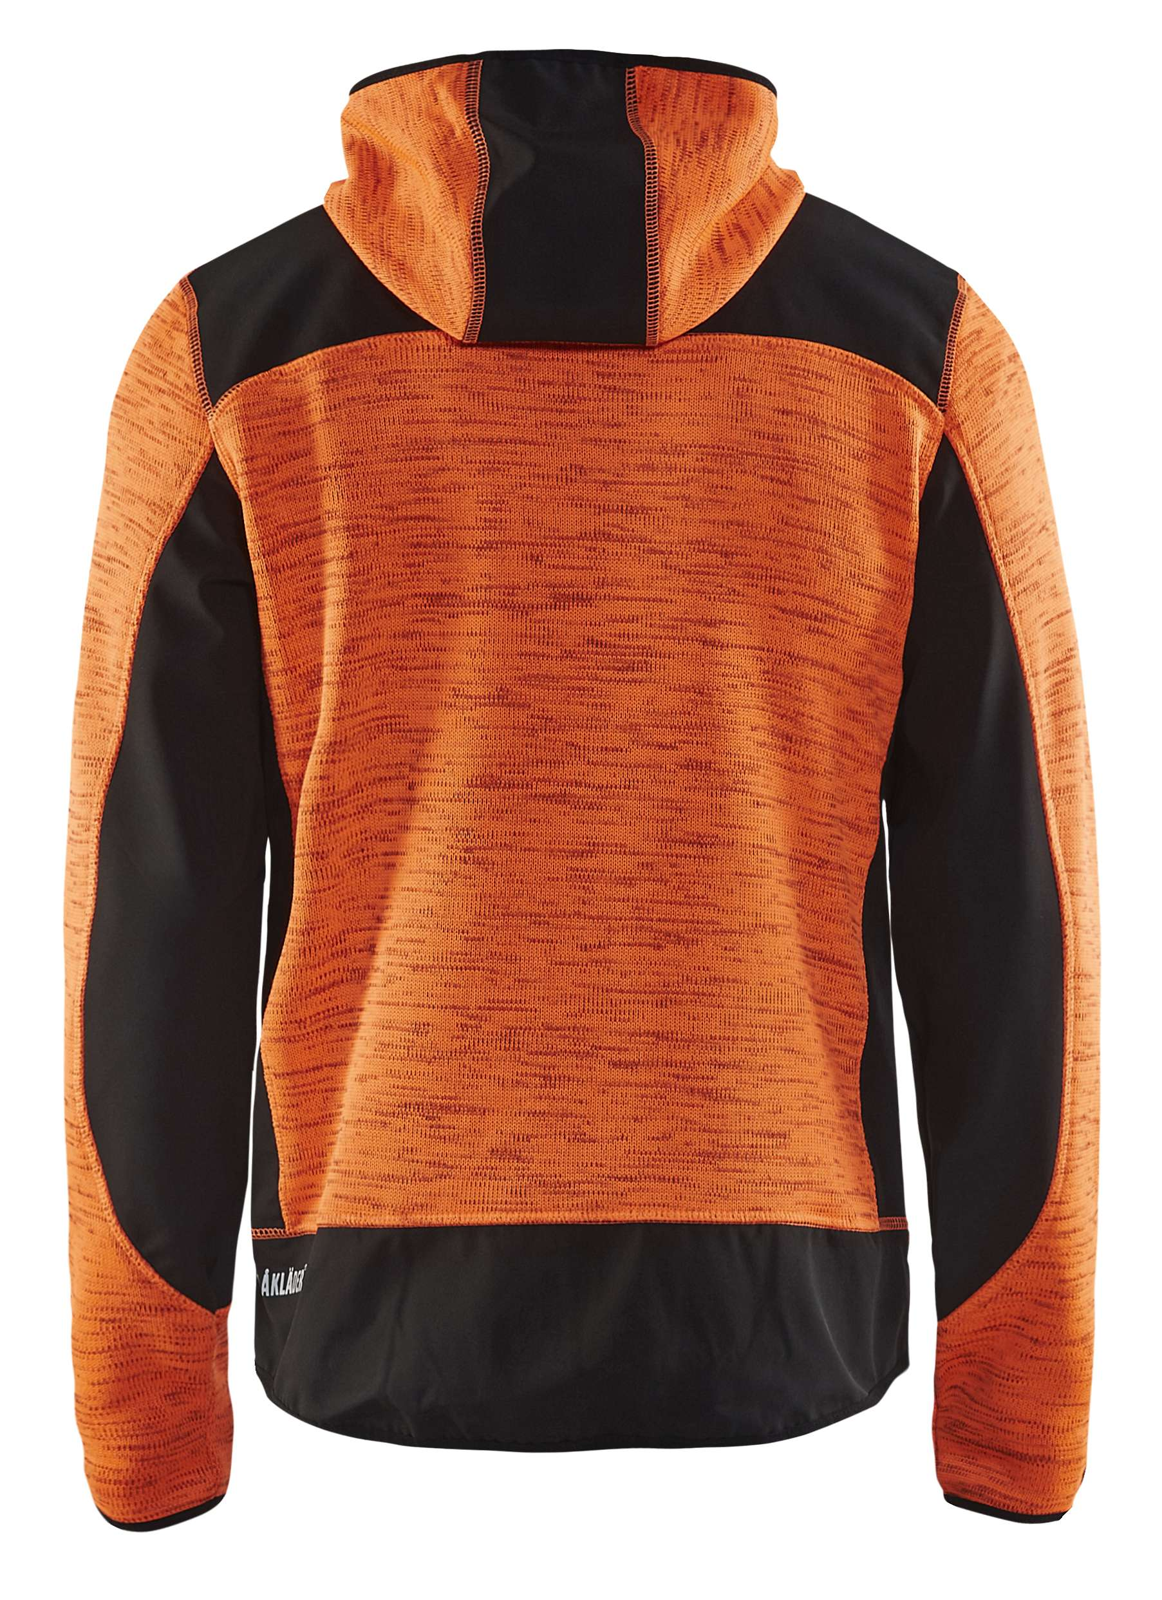 Blaklader Gebreide vesten 49302117 oranje-zwart(5399)